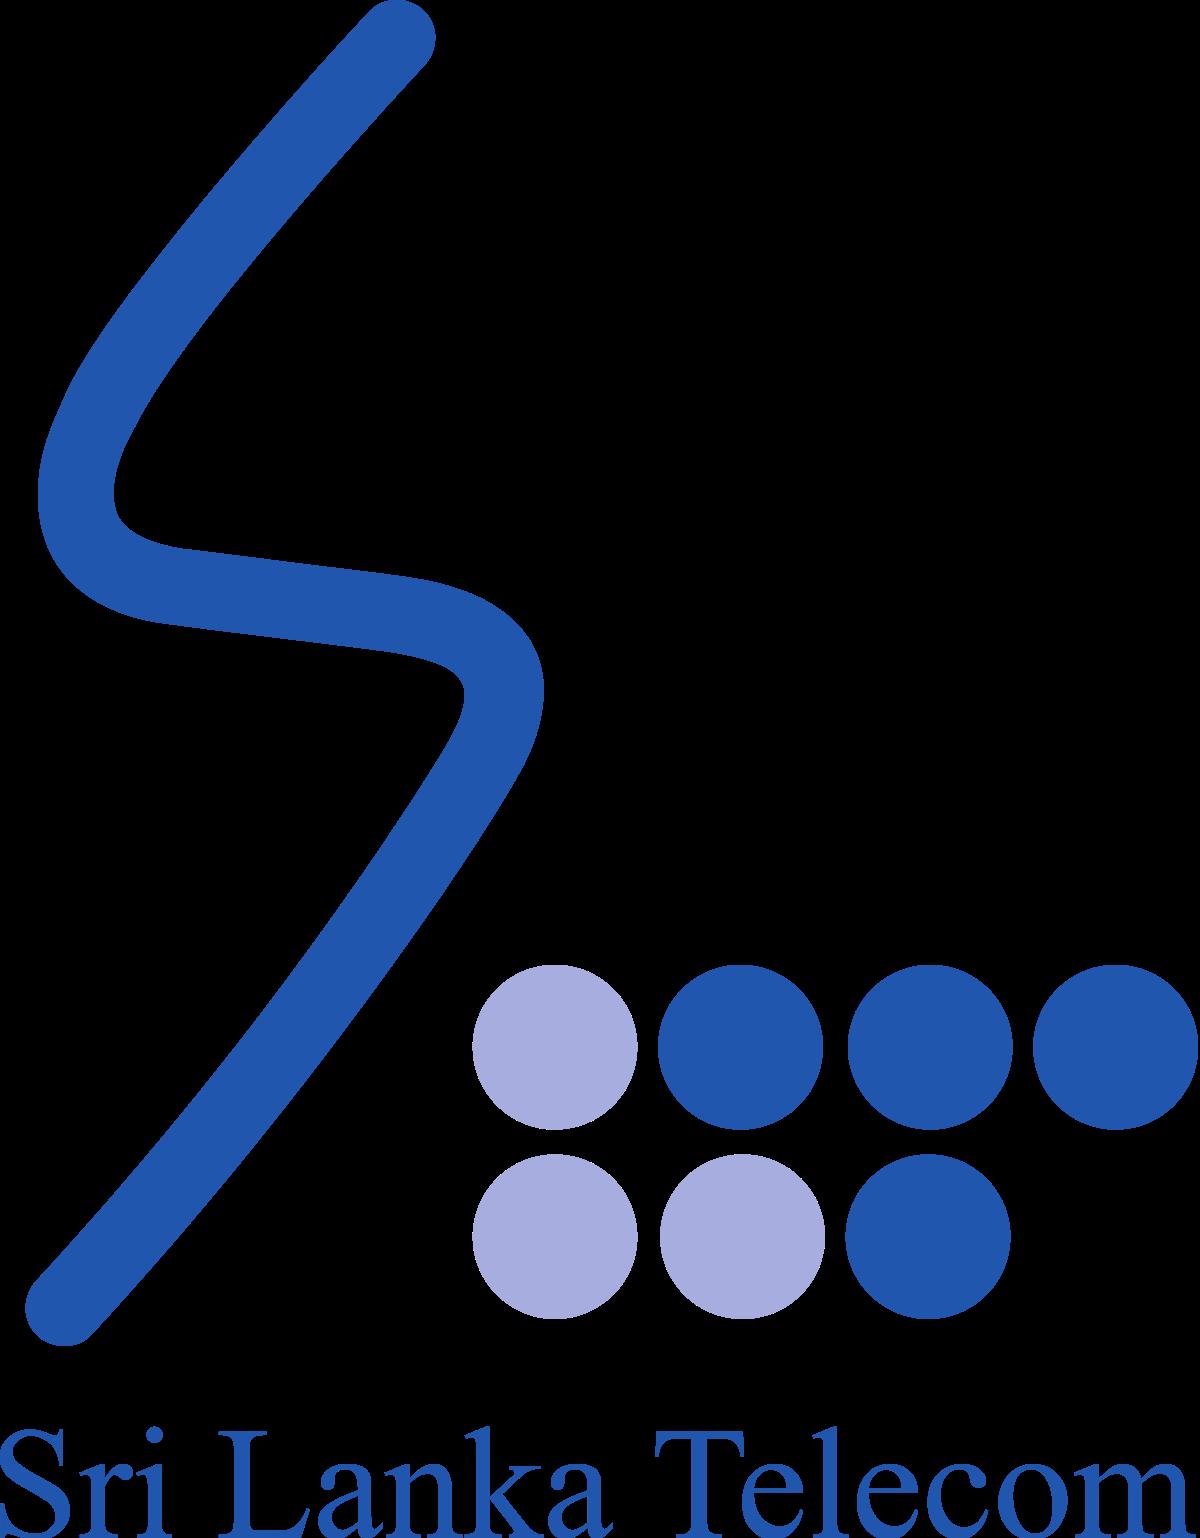 Sri Lanka Telecom Logo